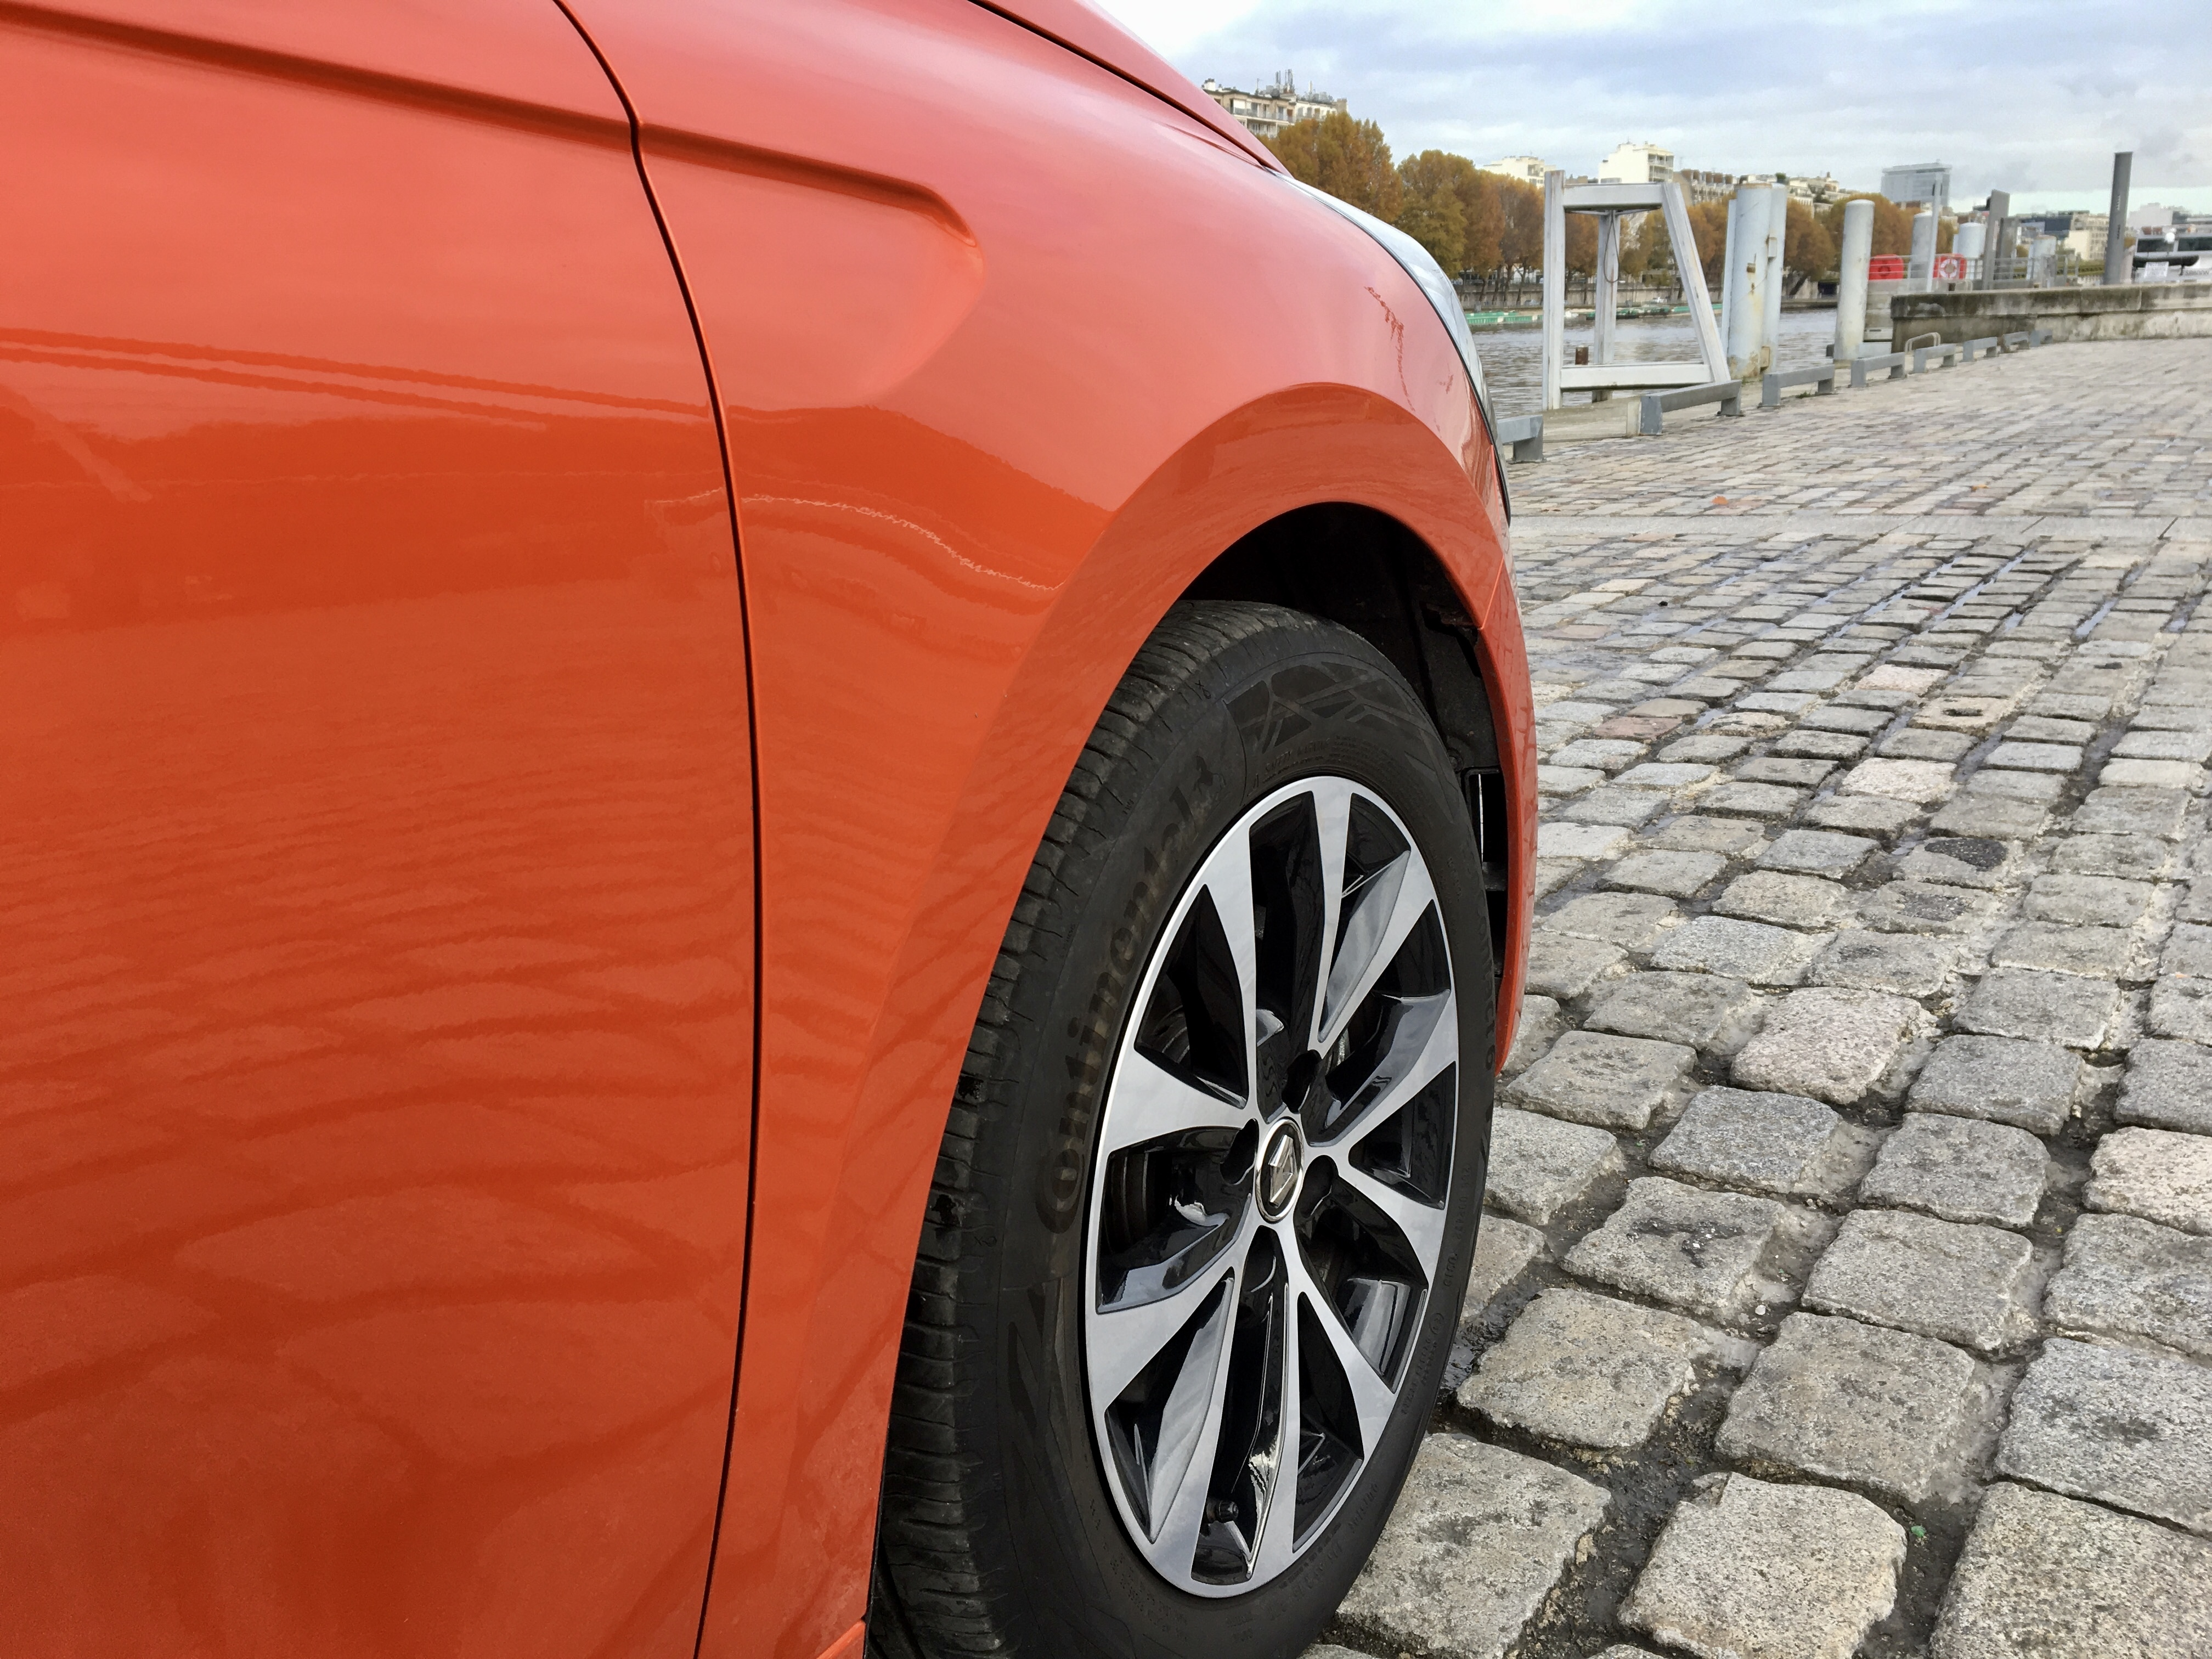 2019 - [Renault] Clio V (BJA) - Page 17 S0-essai-renault-clio-dci-85-611017